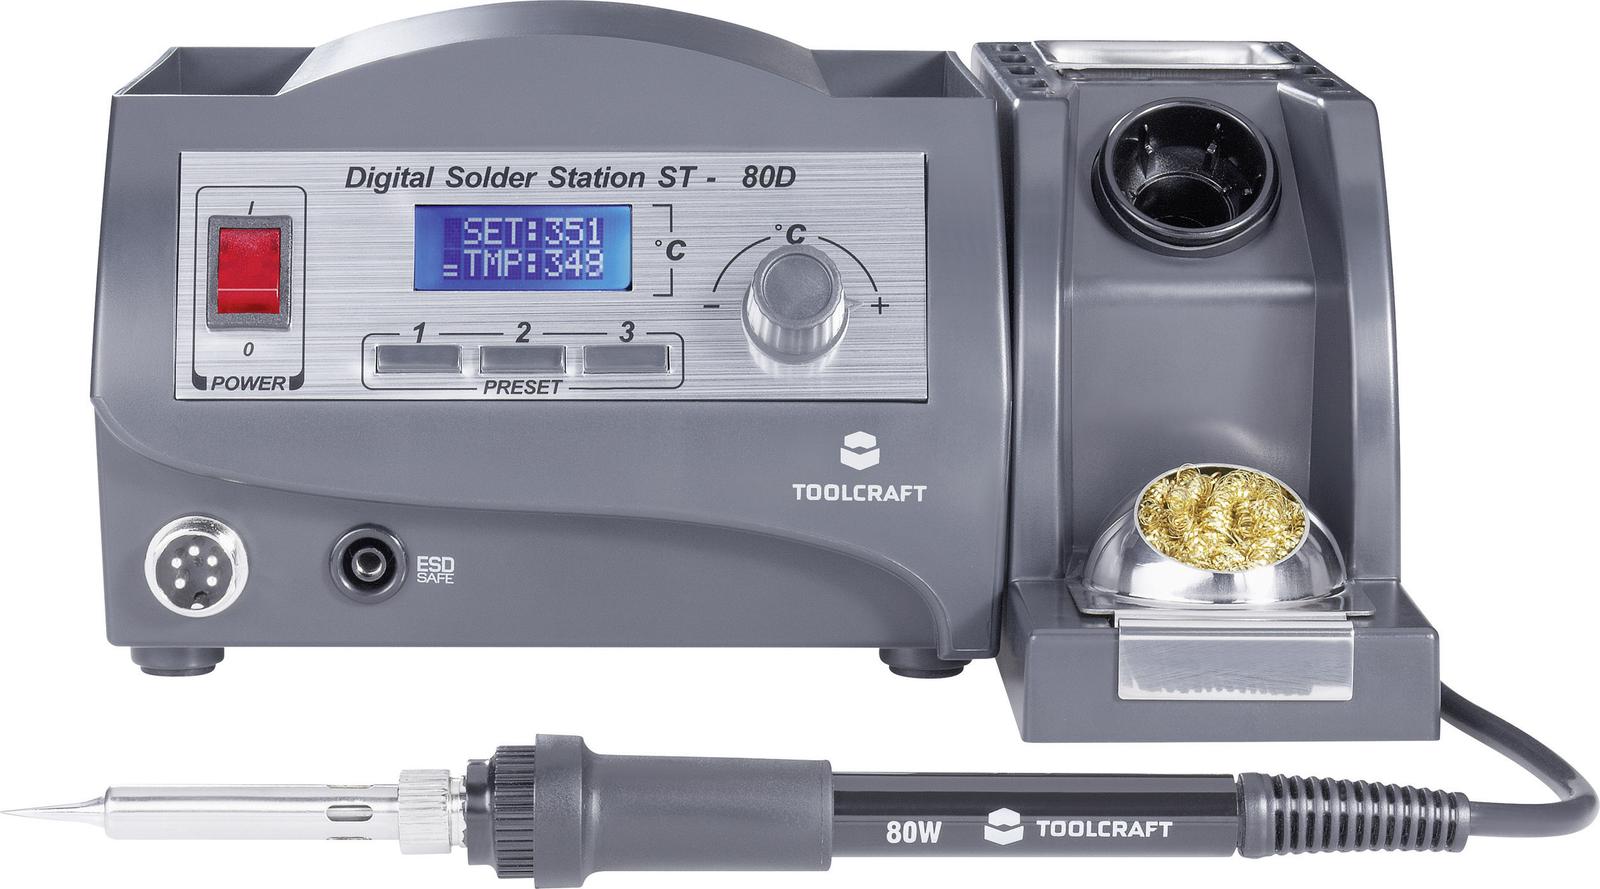 TOOLCRAFT Lötstation digital 80W ST-80D +150 bis +450°C